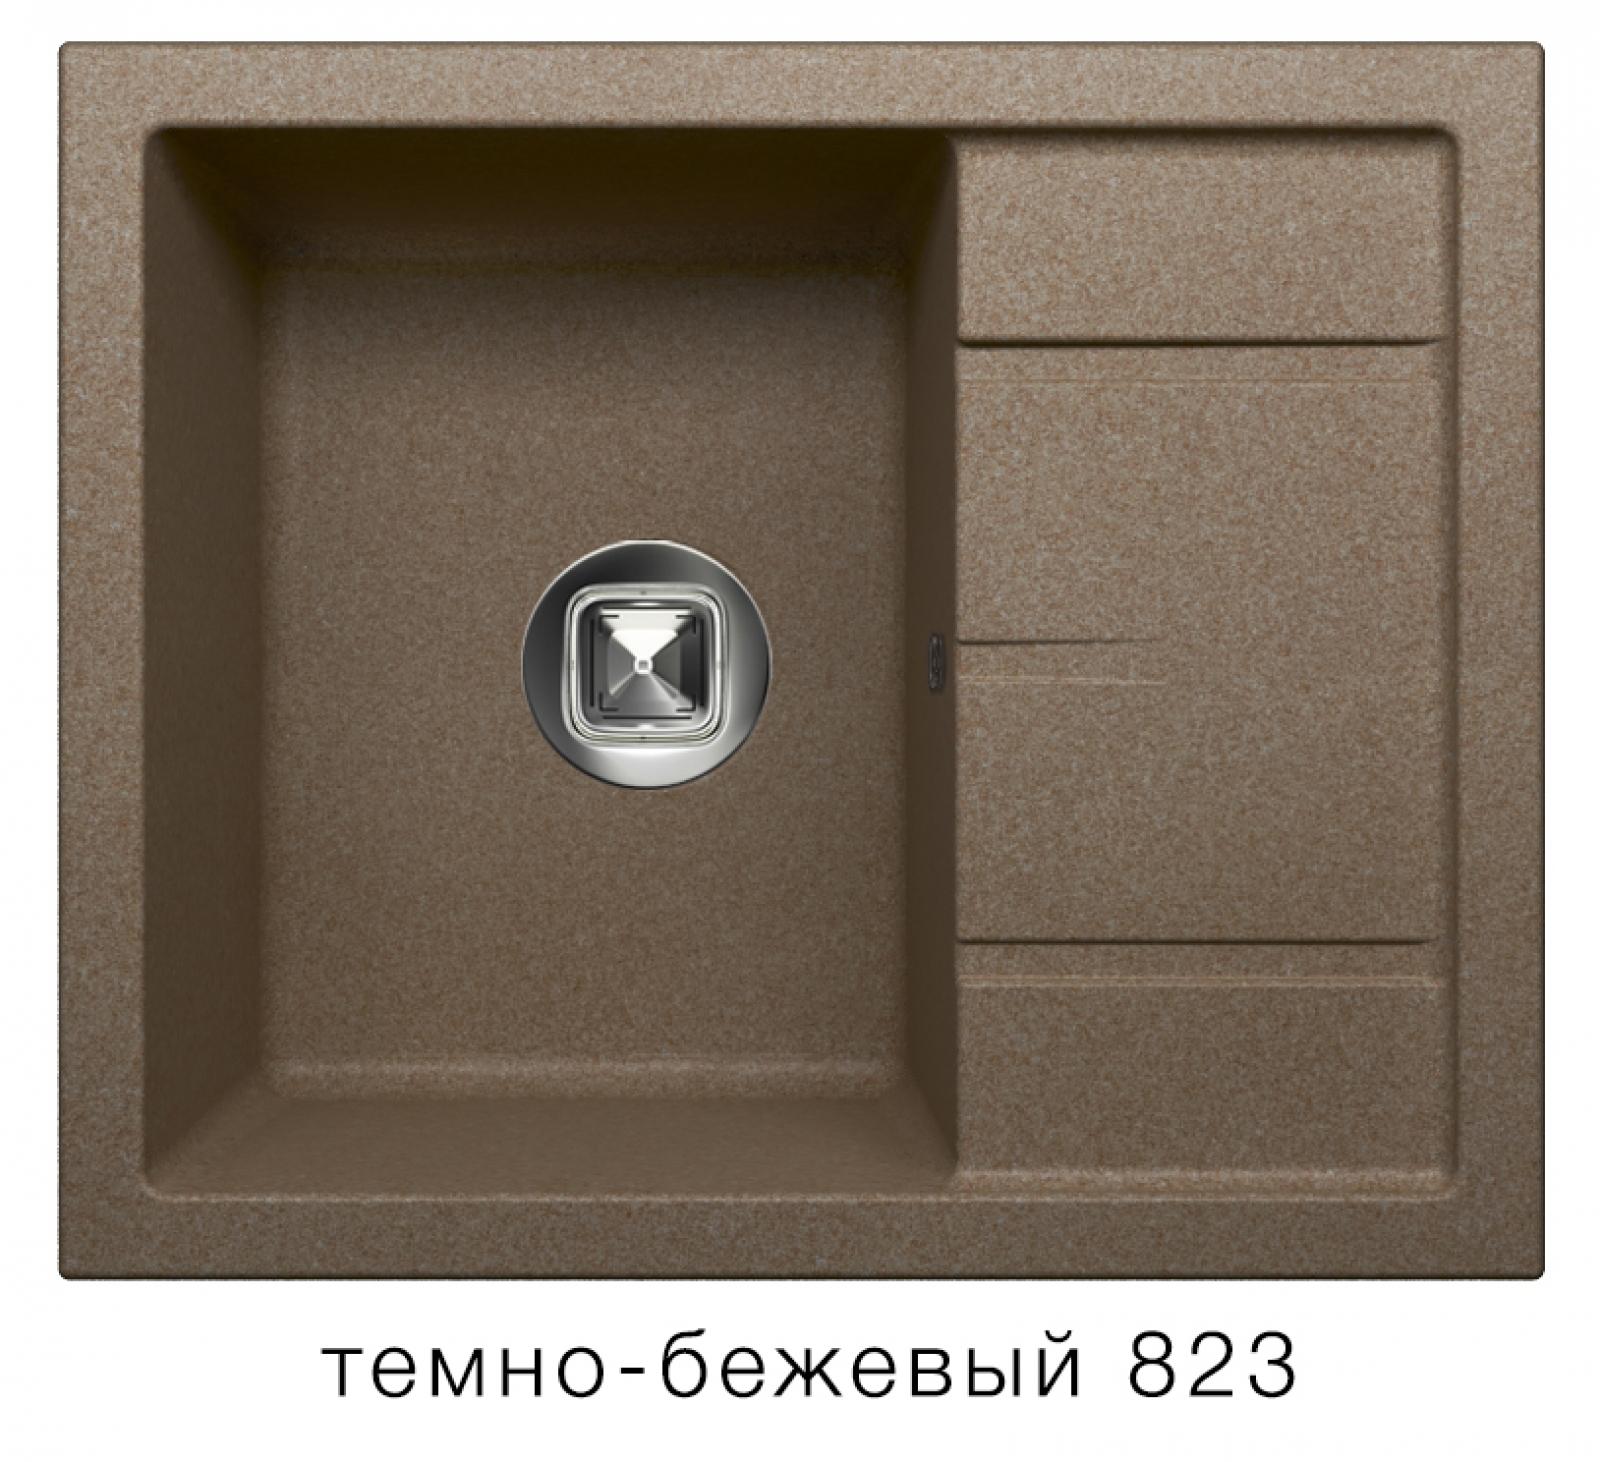 Мойка Tolero-R-107-823, цвет - Темно-бежевый